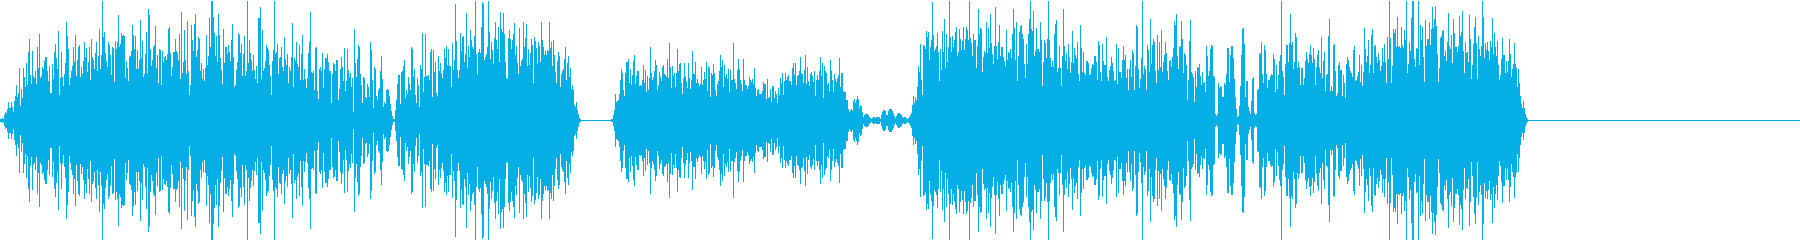 DJプレイ スクラッチ・ノイズ 102の再生済みの波形